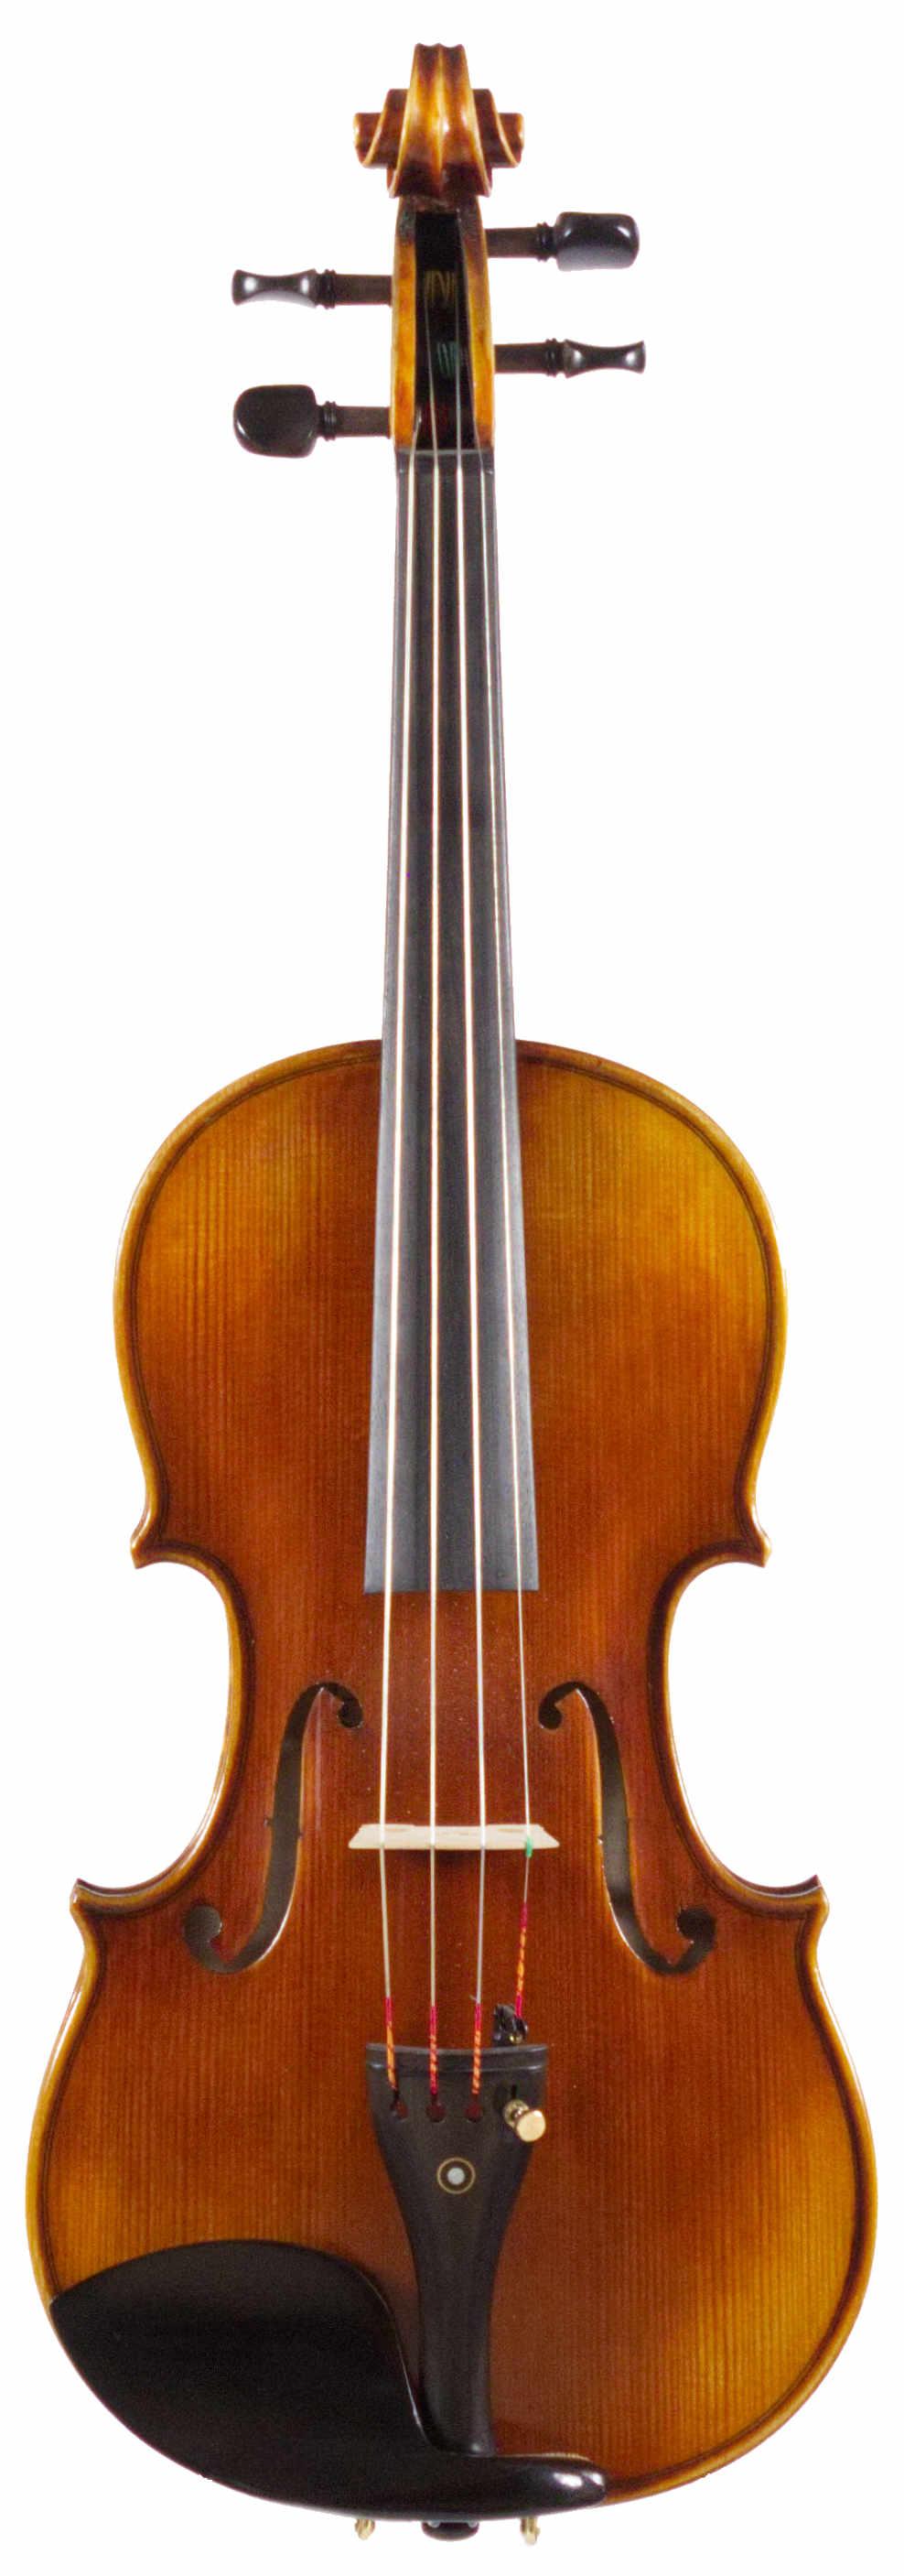 Paolo Lorenzo violin